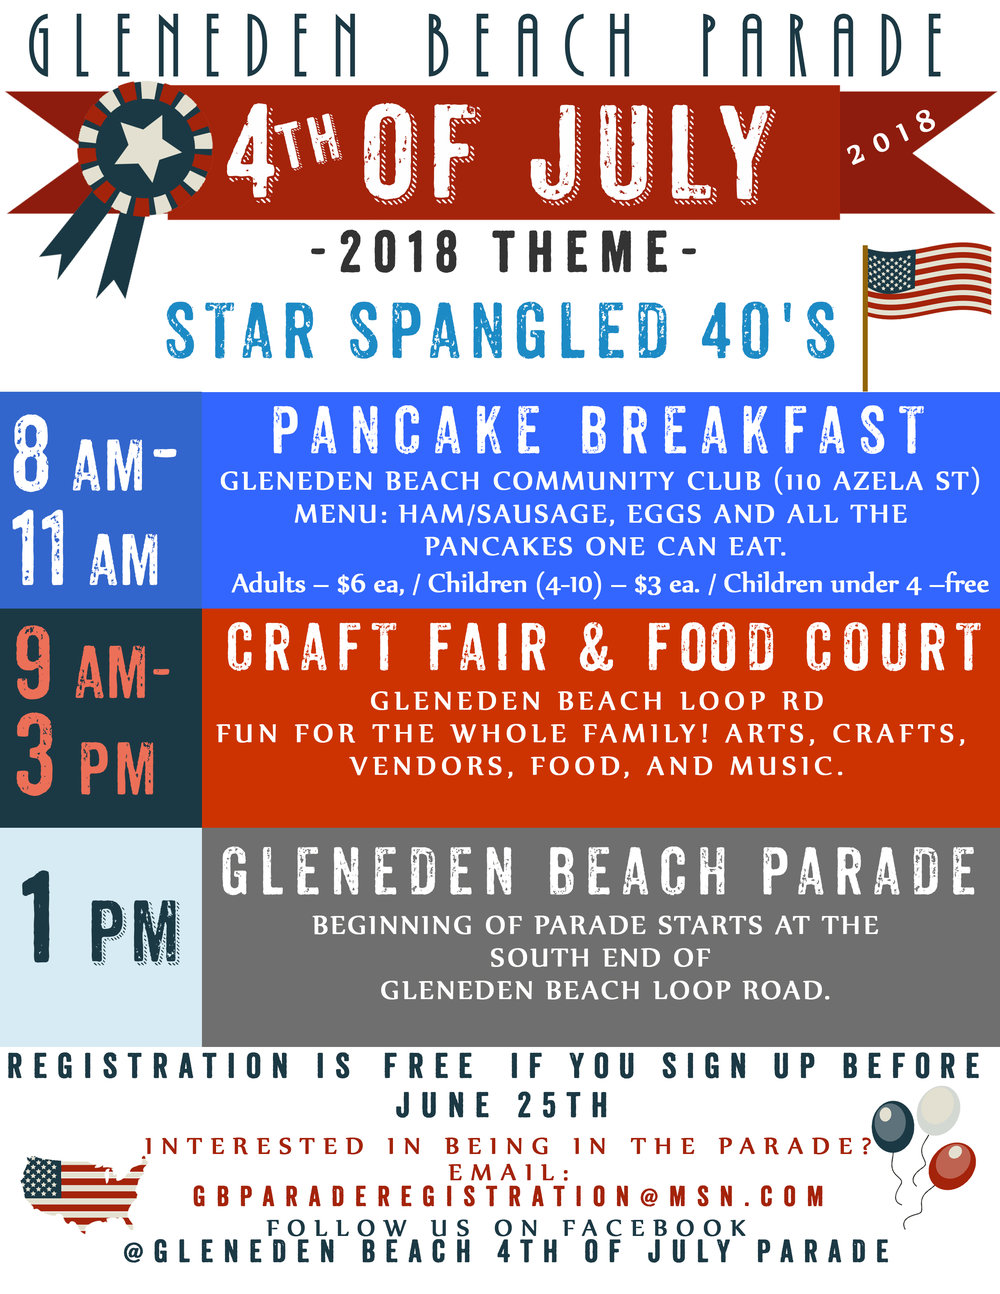 Gleneden Beach 4th of July Parade 2018